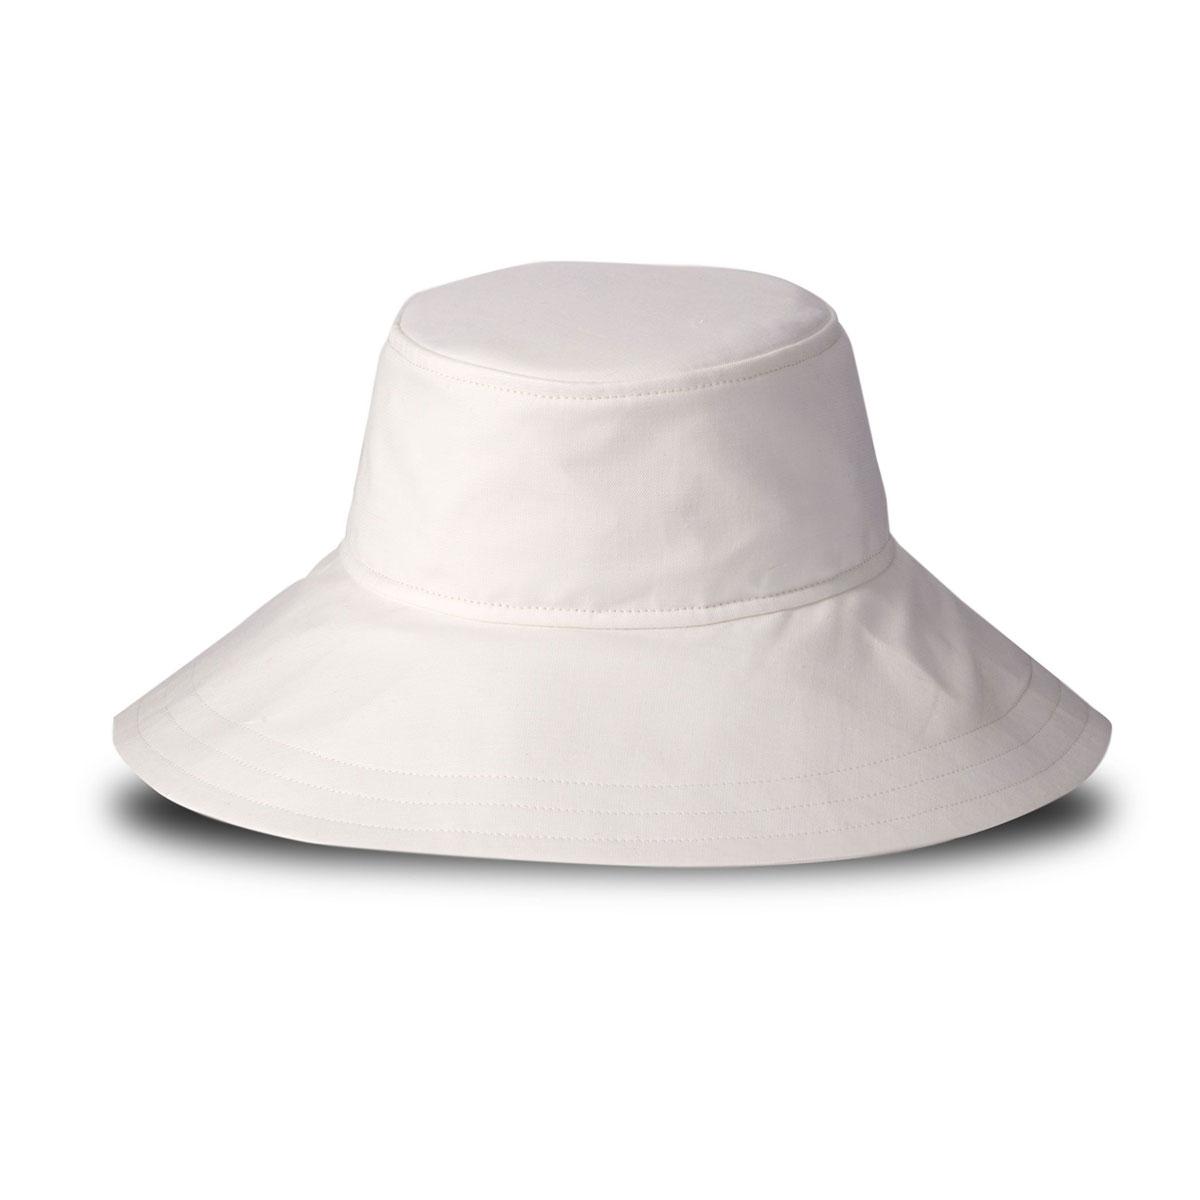 dadcf125b1c Image of Tilley Women s Floppy Brim Hat - Natural ...